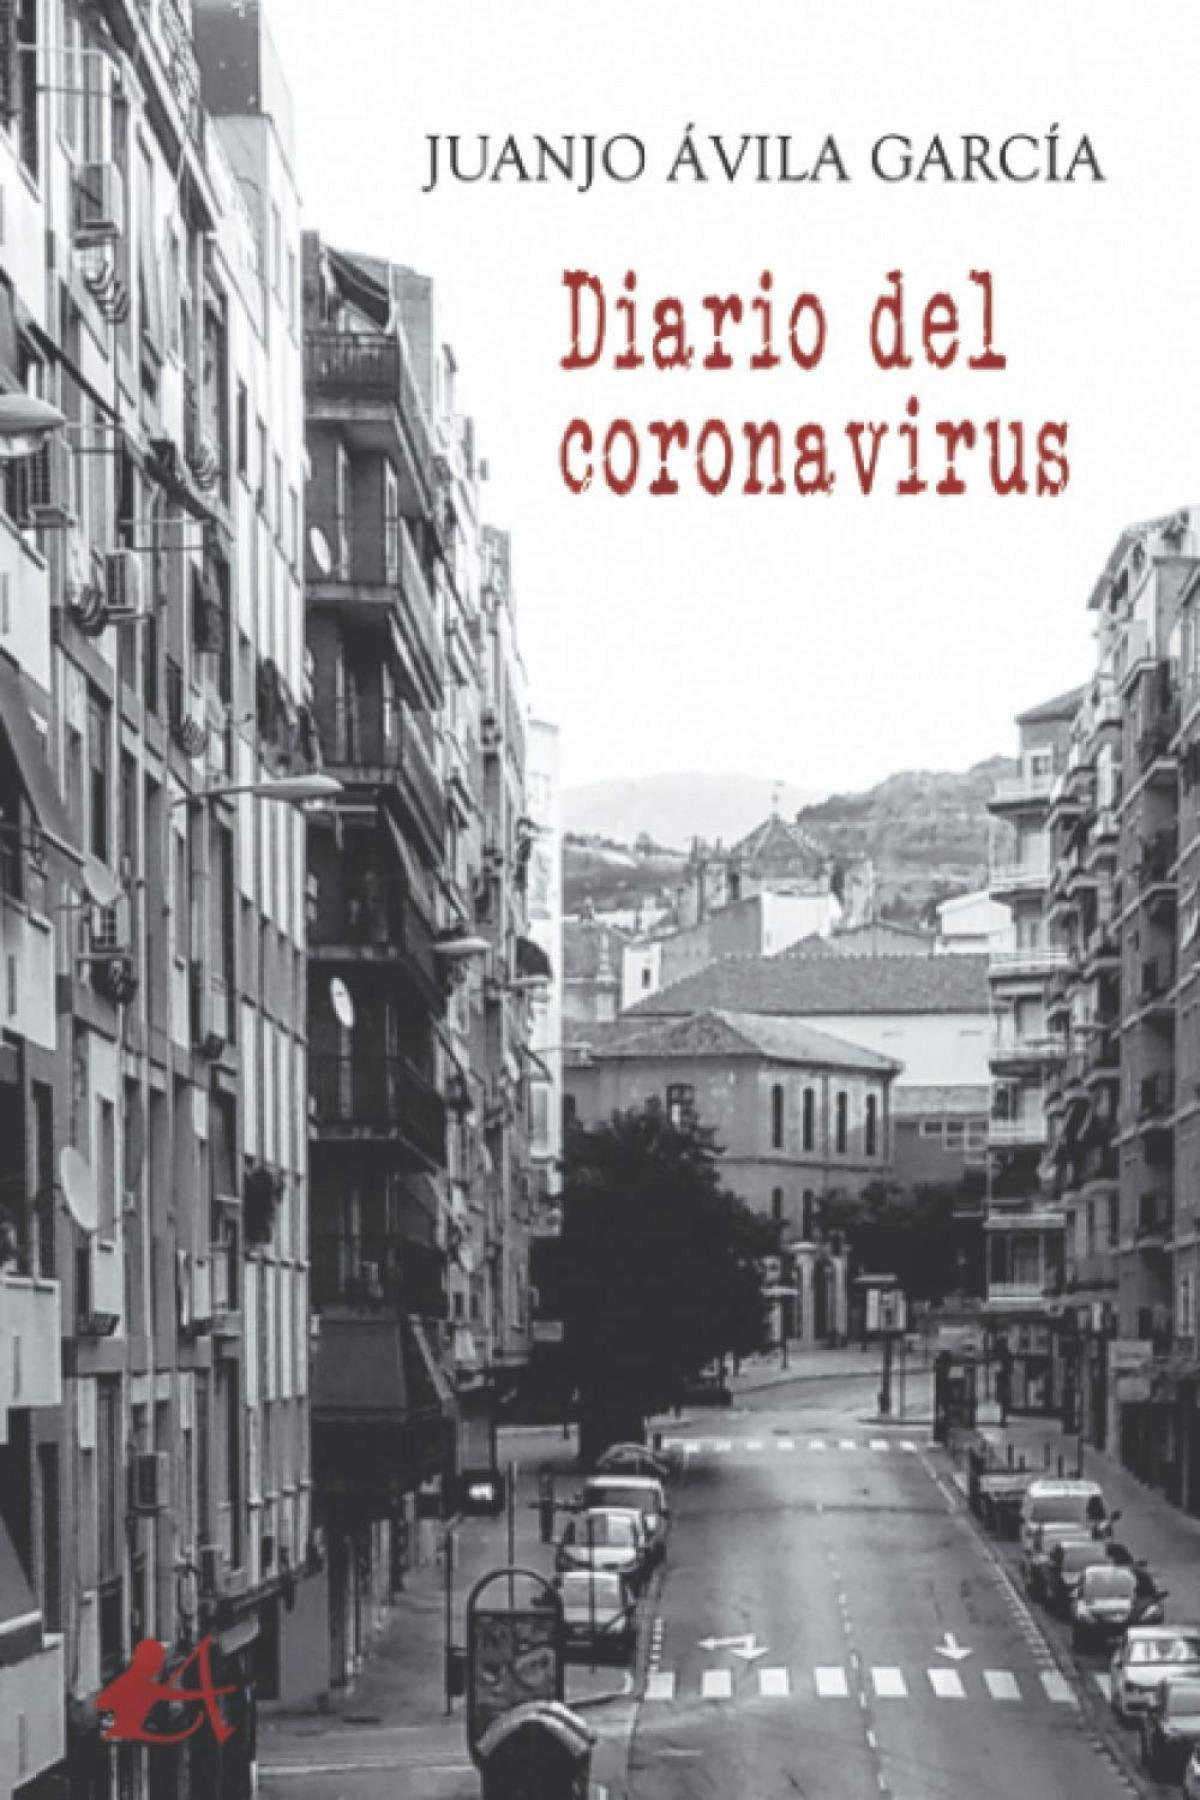 Diario del coronavirus